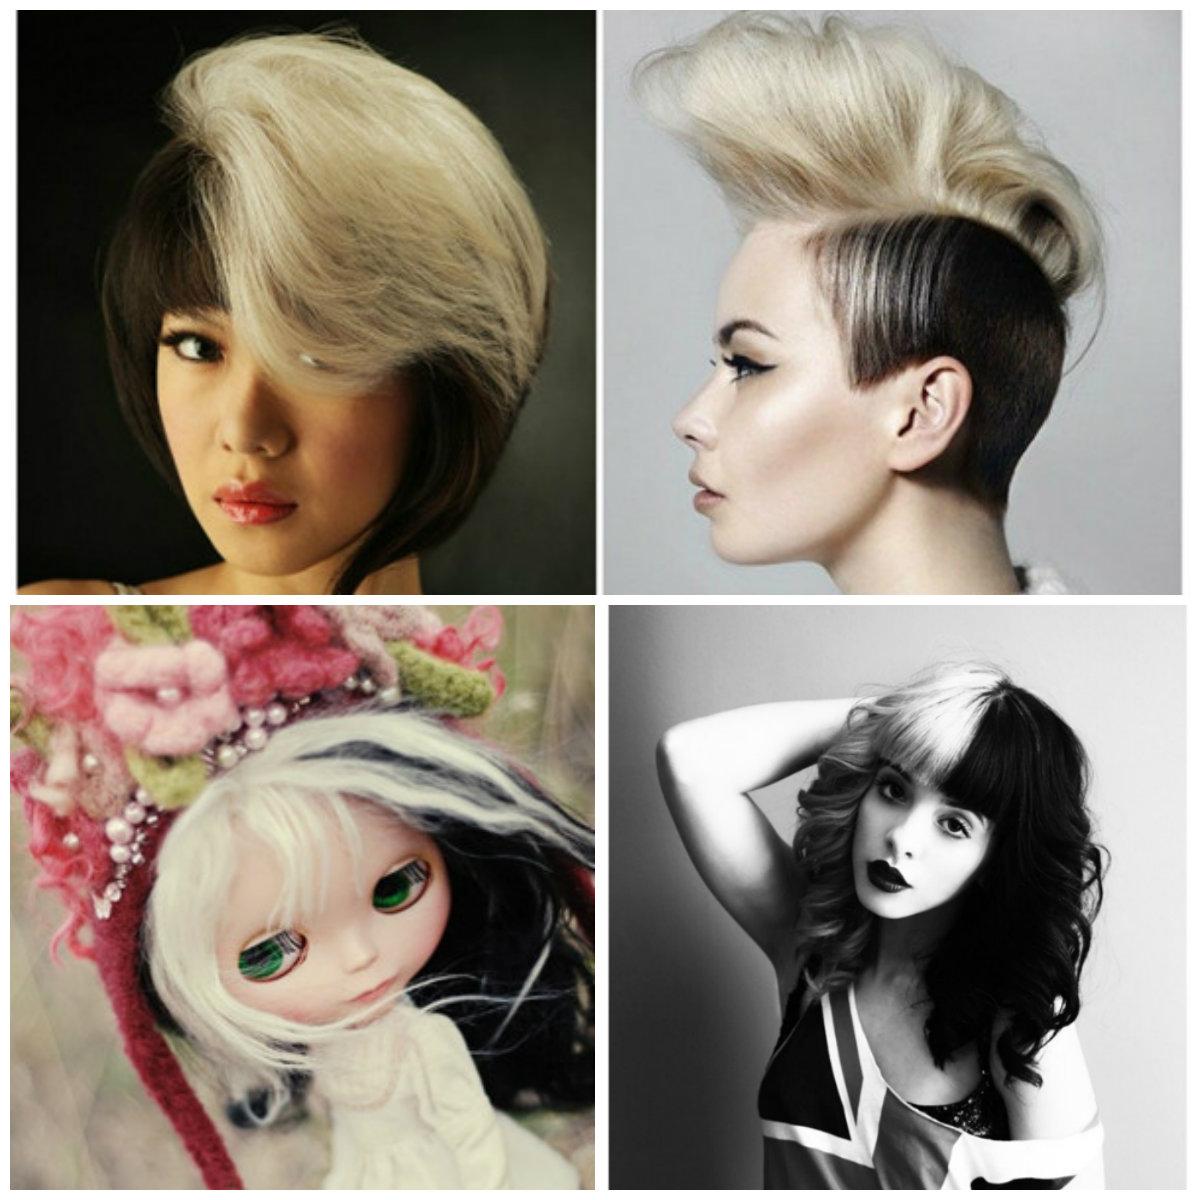 Покраска волос в два цвета: черно-белый вариант